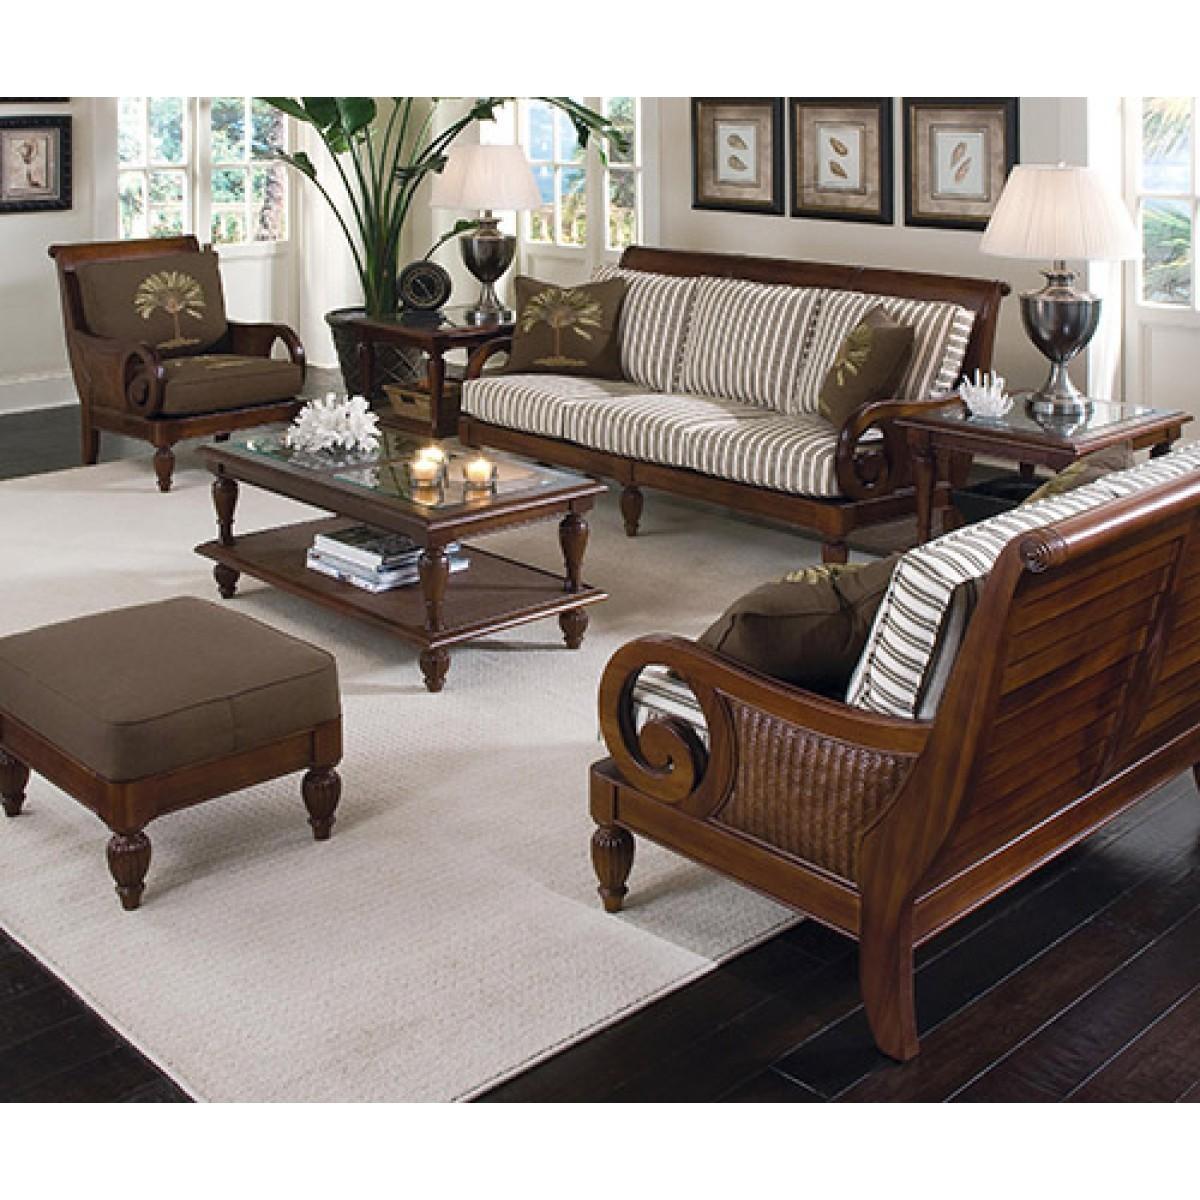 Braxton Culler Sofa | Sofa Gallery | Kengire Inside Braxton Culler Sofas (Image 12 of 20)